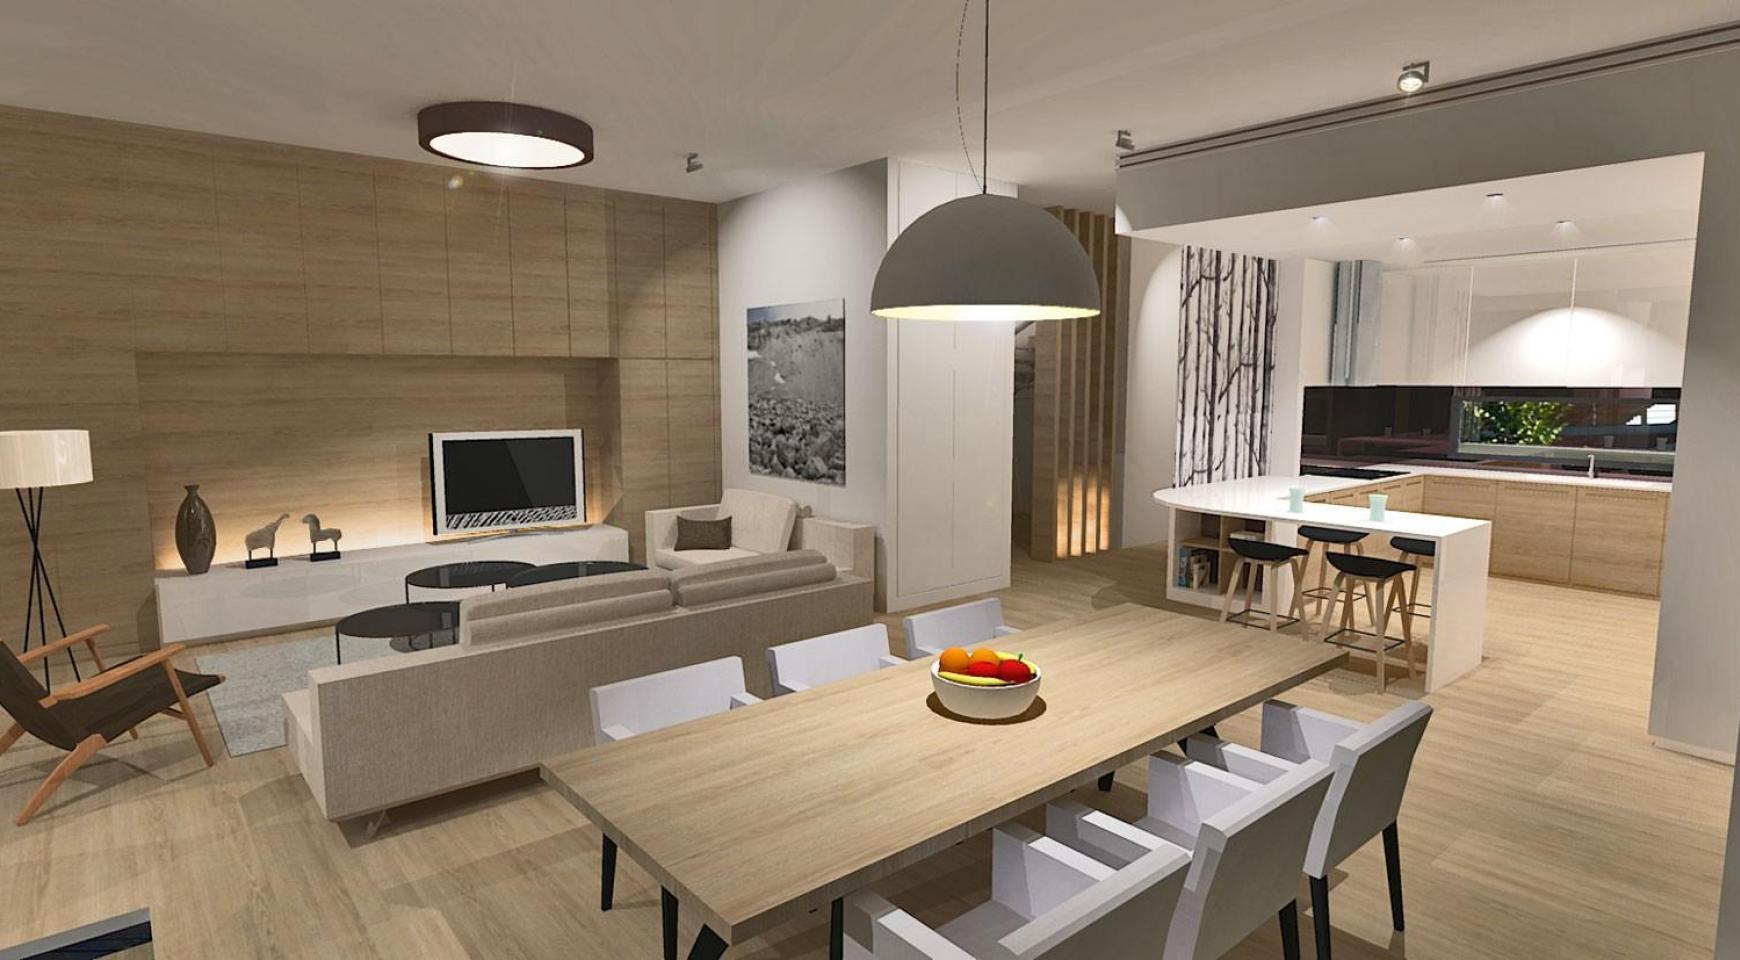 Spacious 4 Bedroom Villa in a New Complex in Agios Athanasios Area - 10